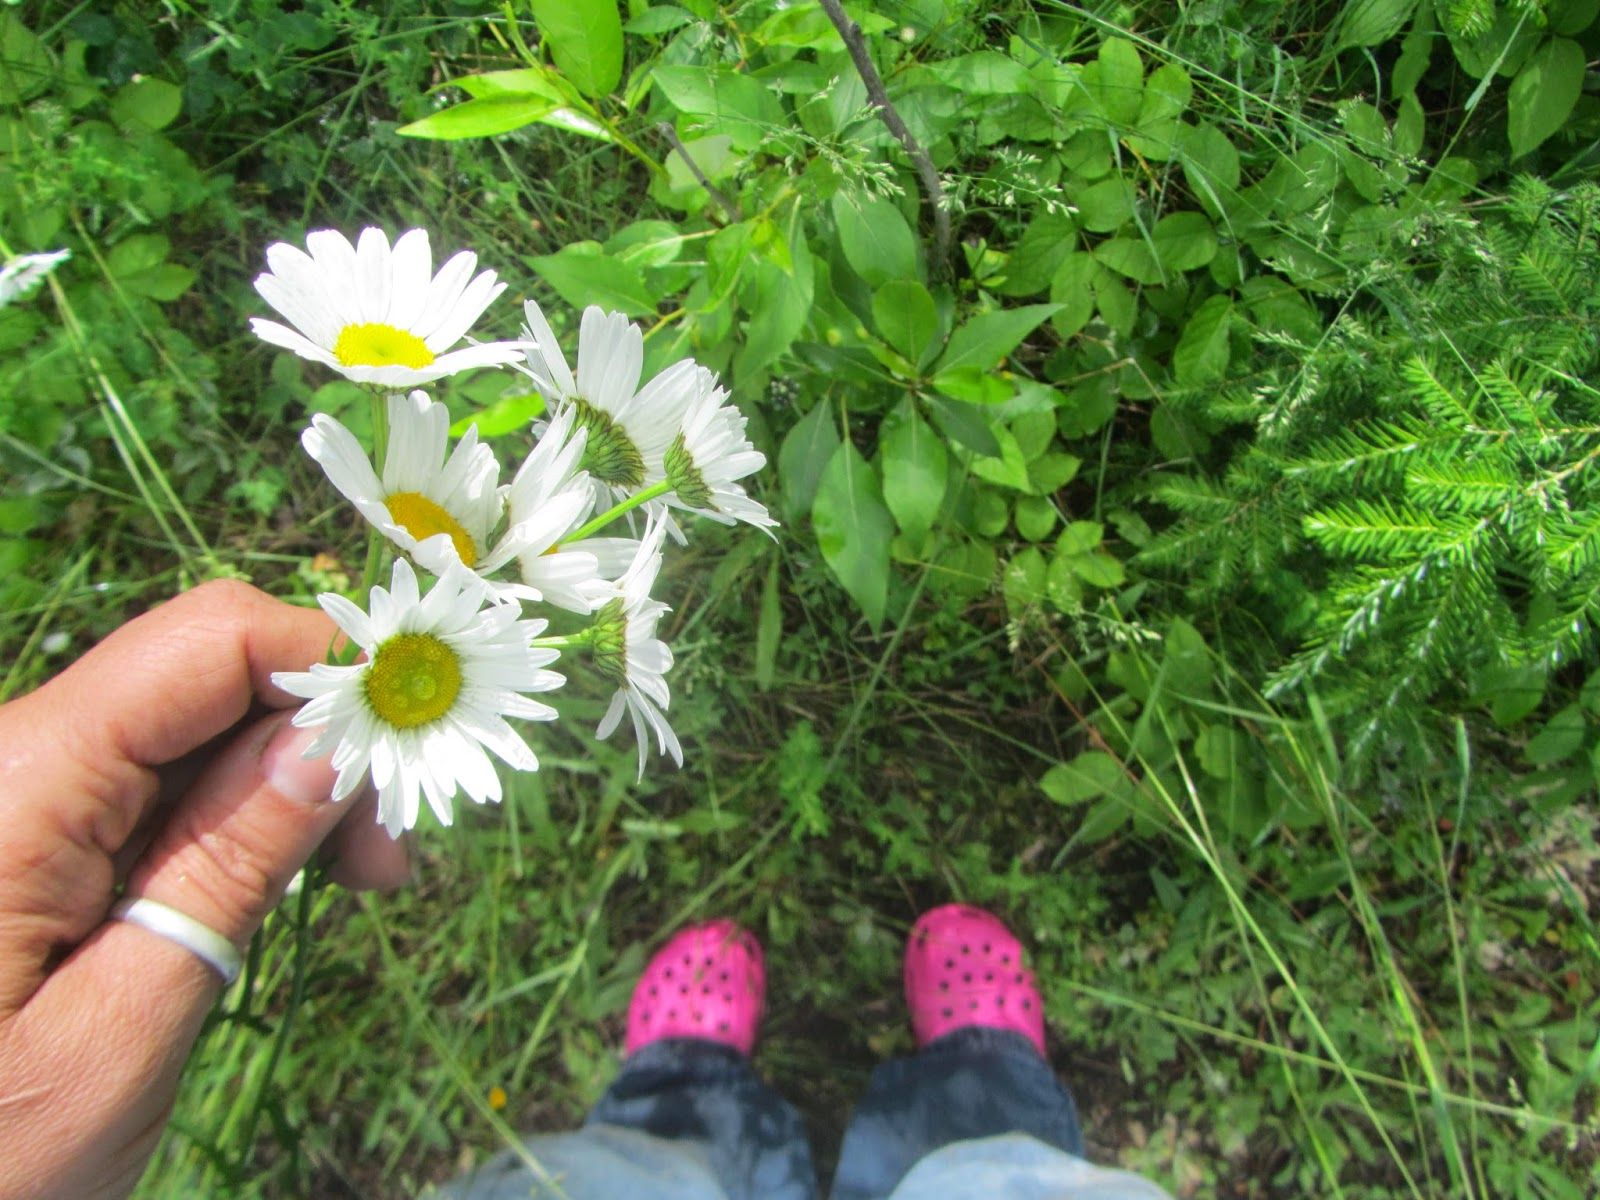 Picking Daisies in North Idaho